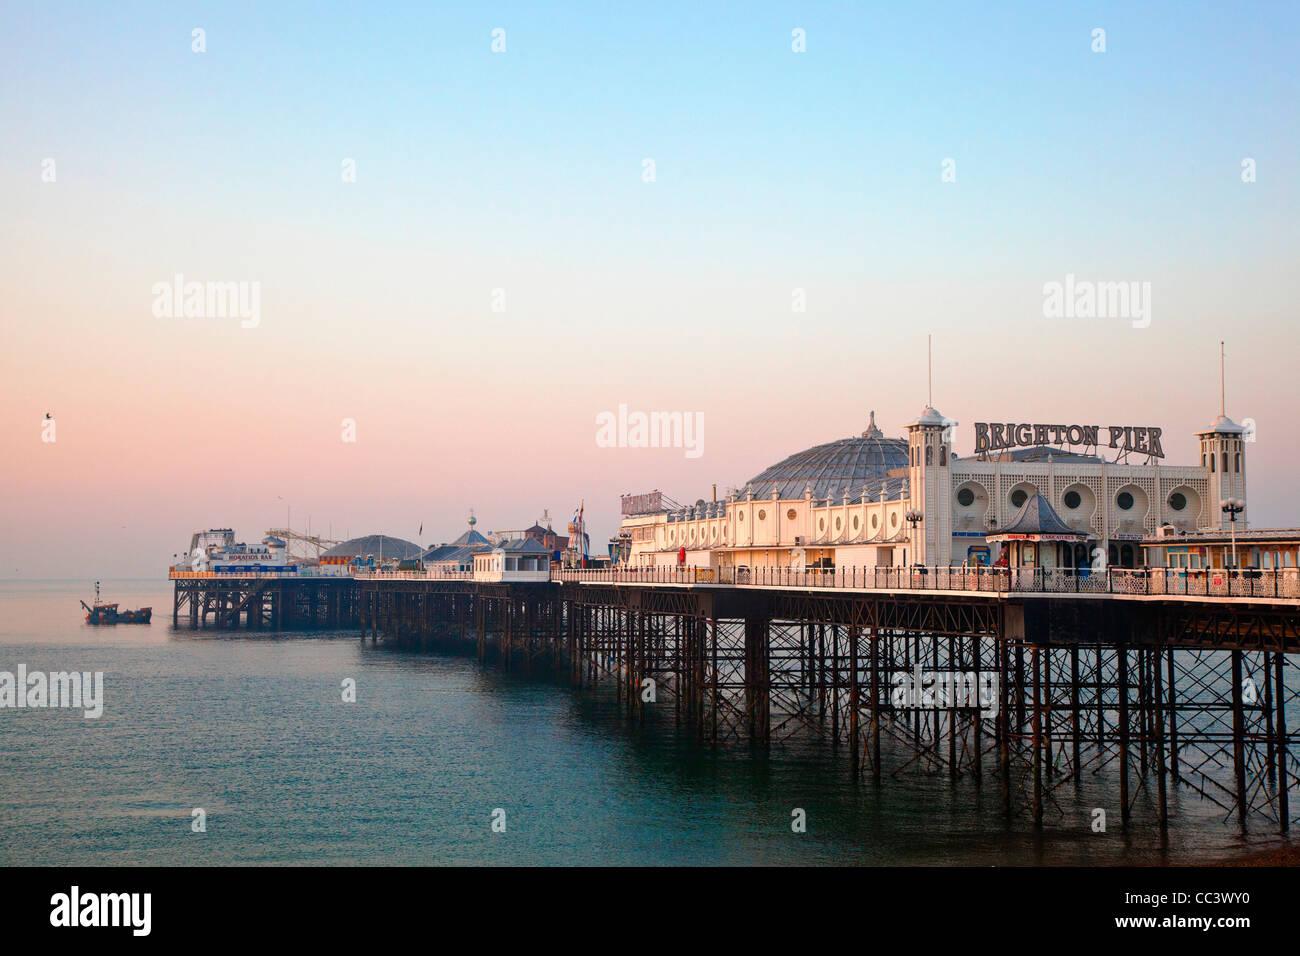 United Kingdom, England, The Brighton Marine Palace and Pier - Stock Image